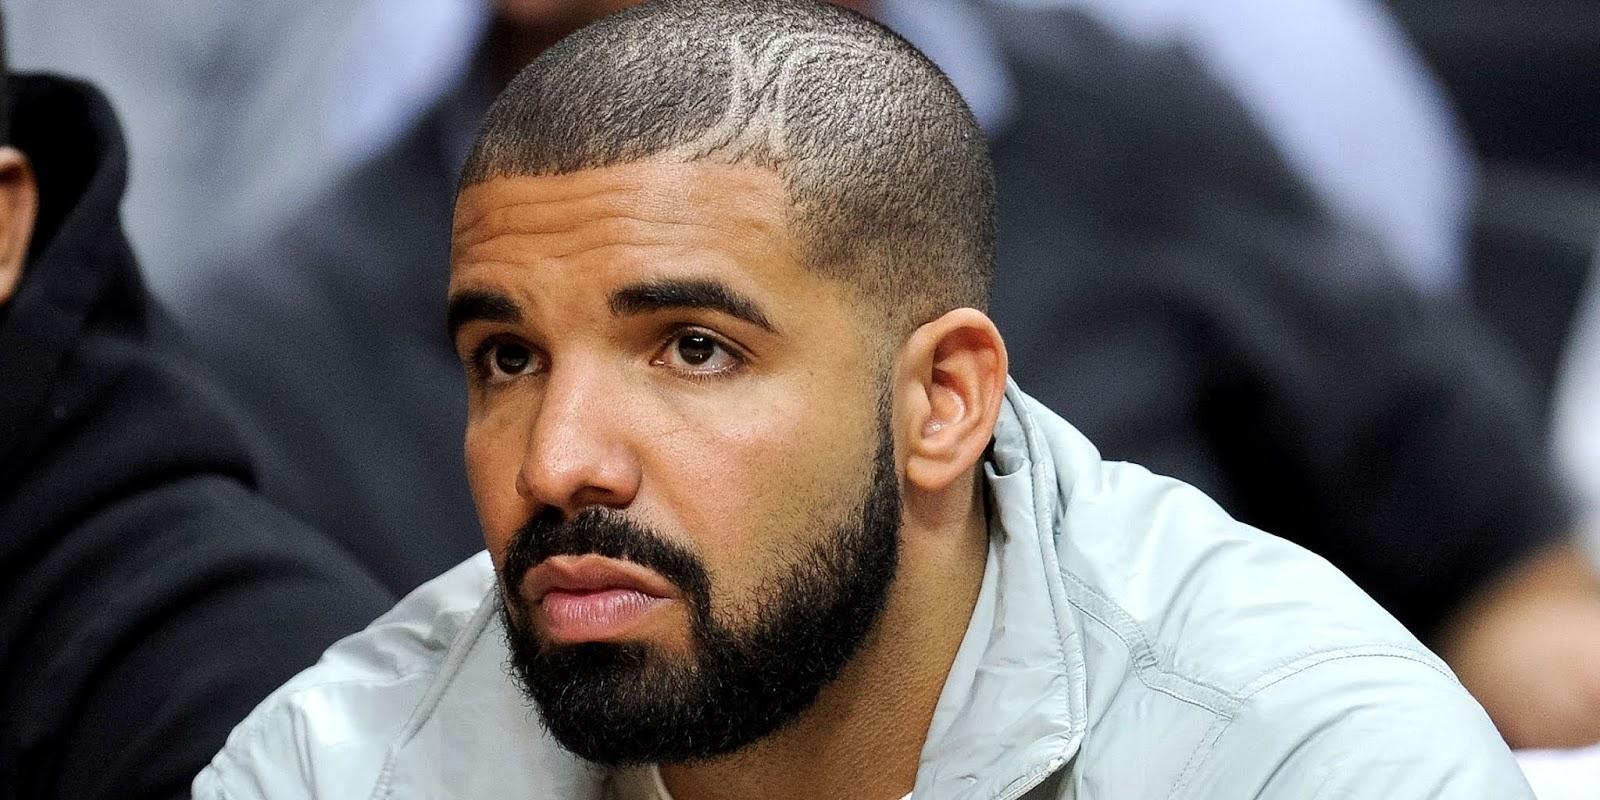 051316 Music In Memorium of Drakes Beard Drake Courtside